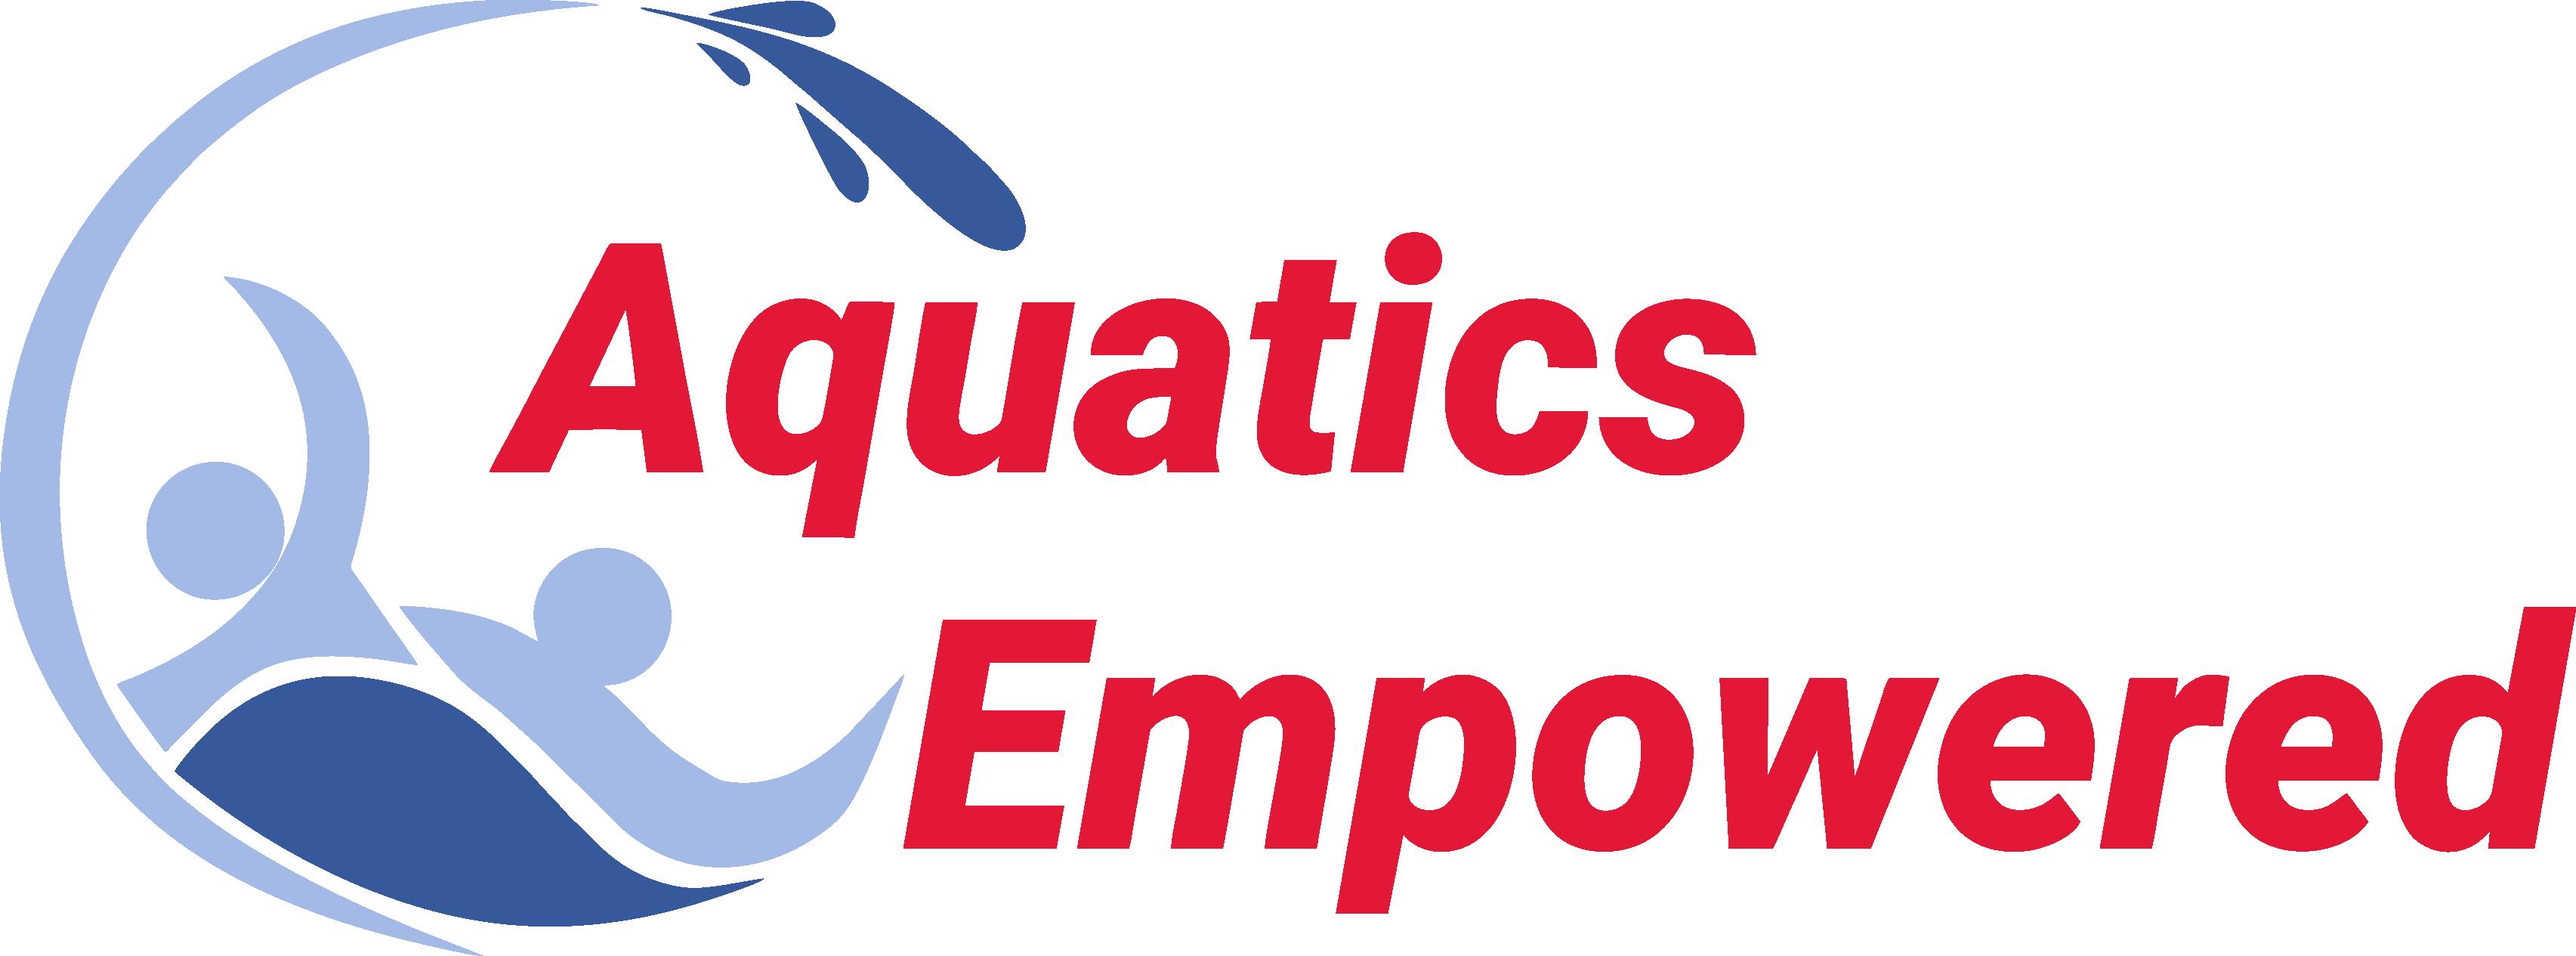 Aquatics Empowered